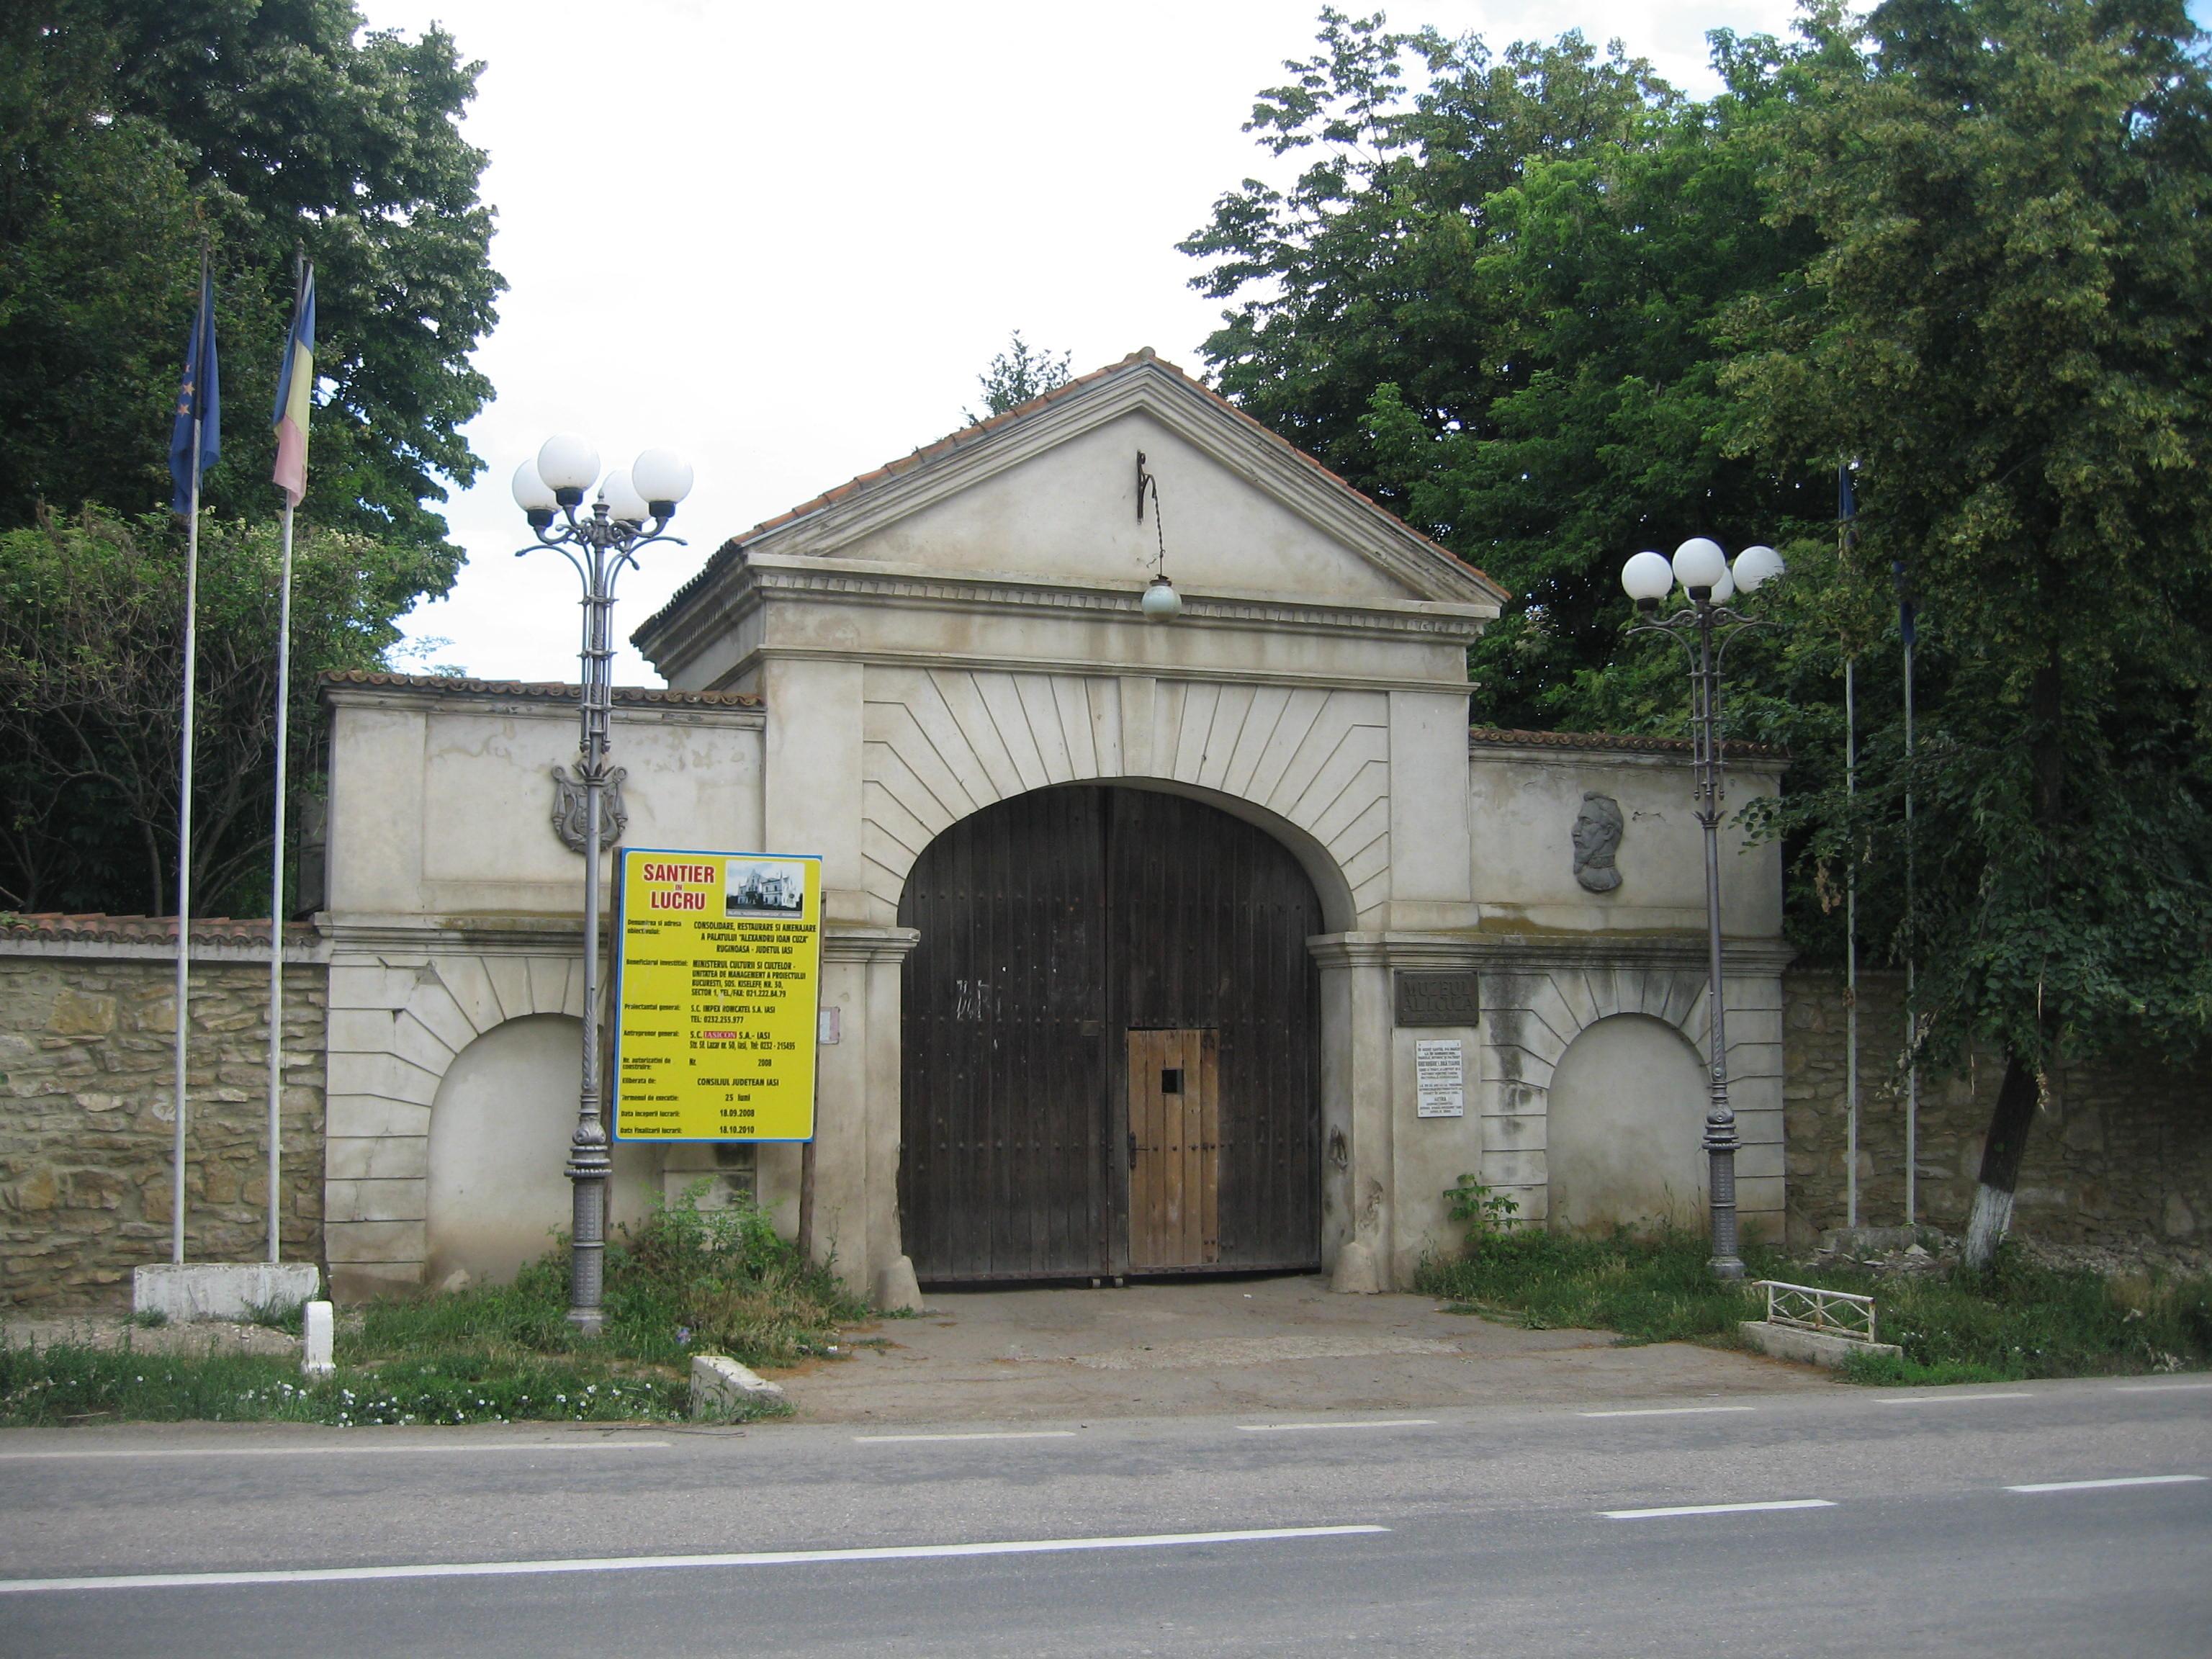 http://upload.wikimedia.org/wikipedia/commons/3/3c/Palatul_de_la_Ruginoasa0.jpg